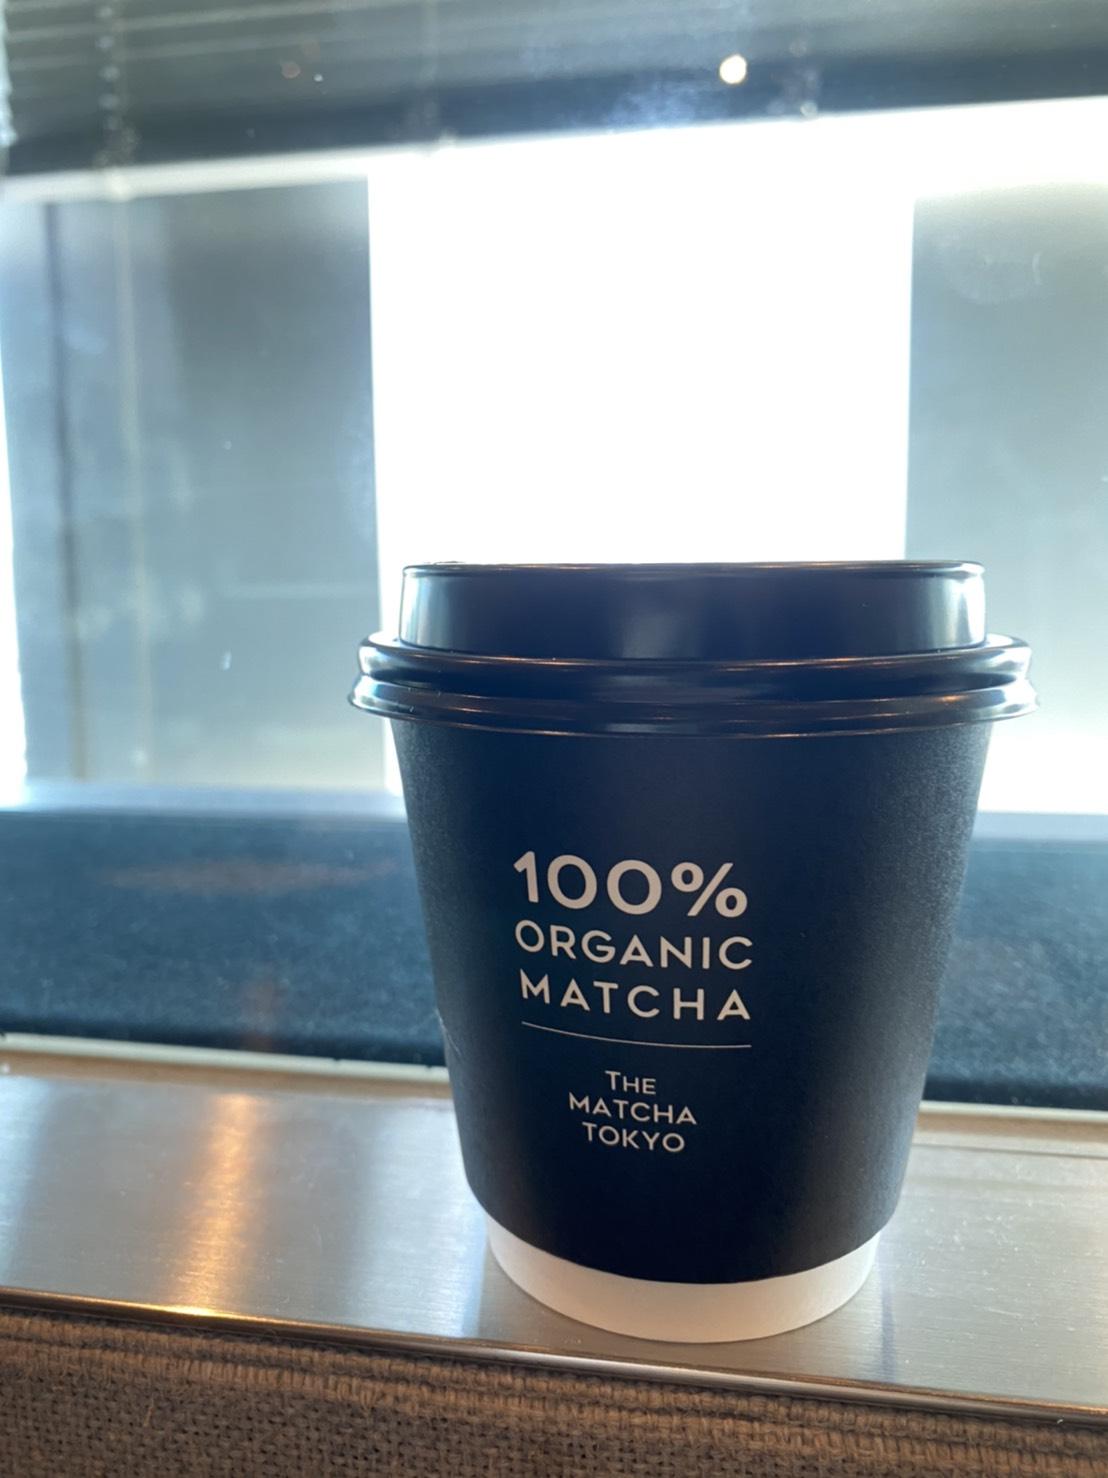 「THE MATCHA TOKYO」の抹茶ココナッツラテ